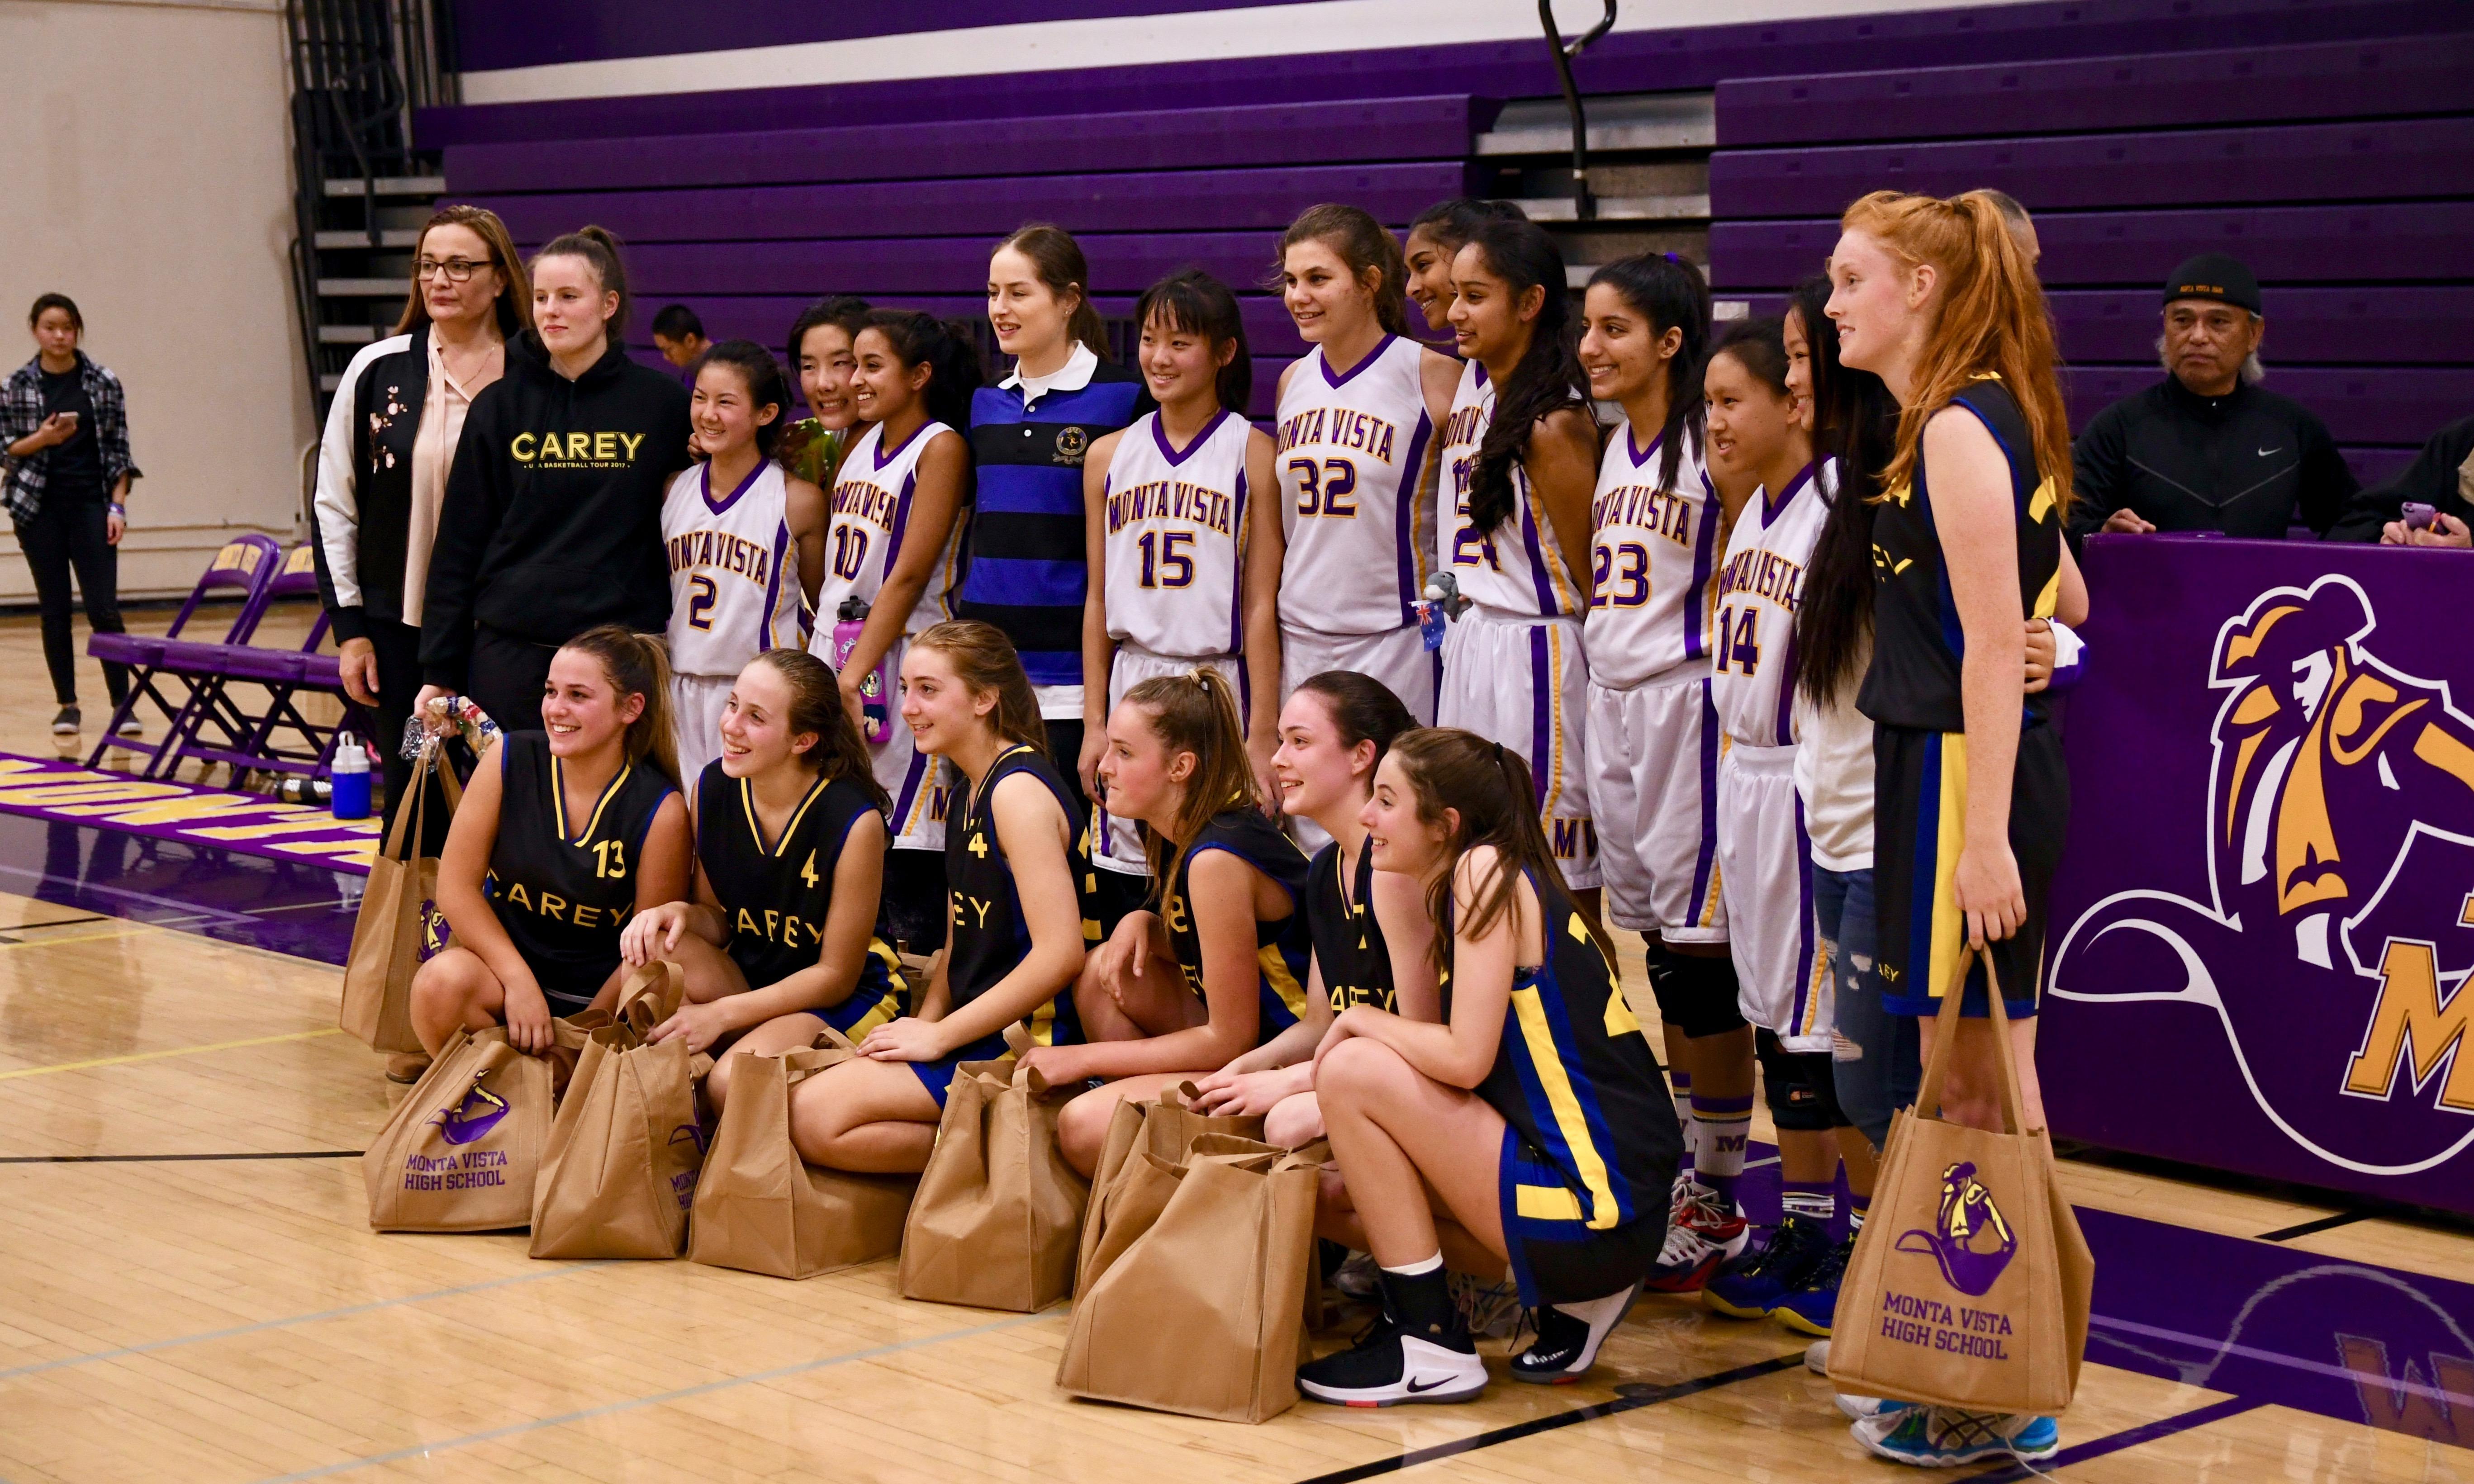 GIRLS BBALL vs Cary HS - 22